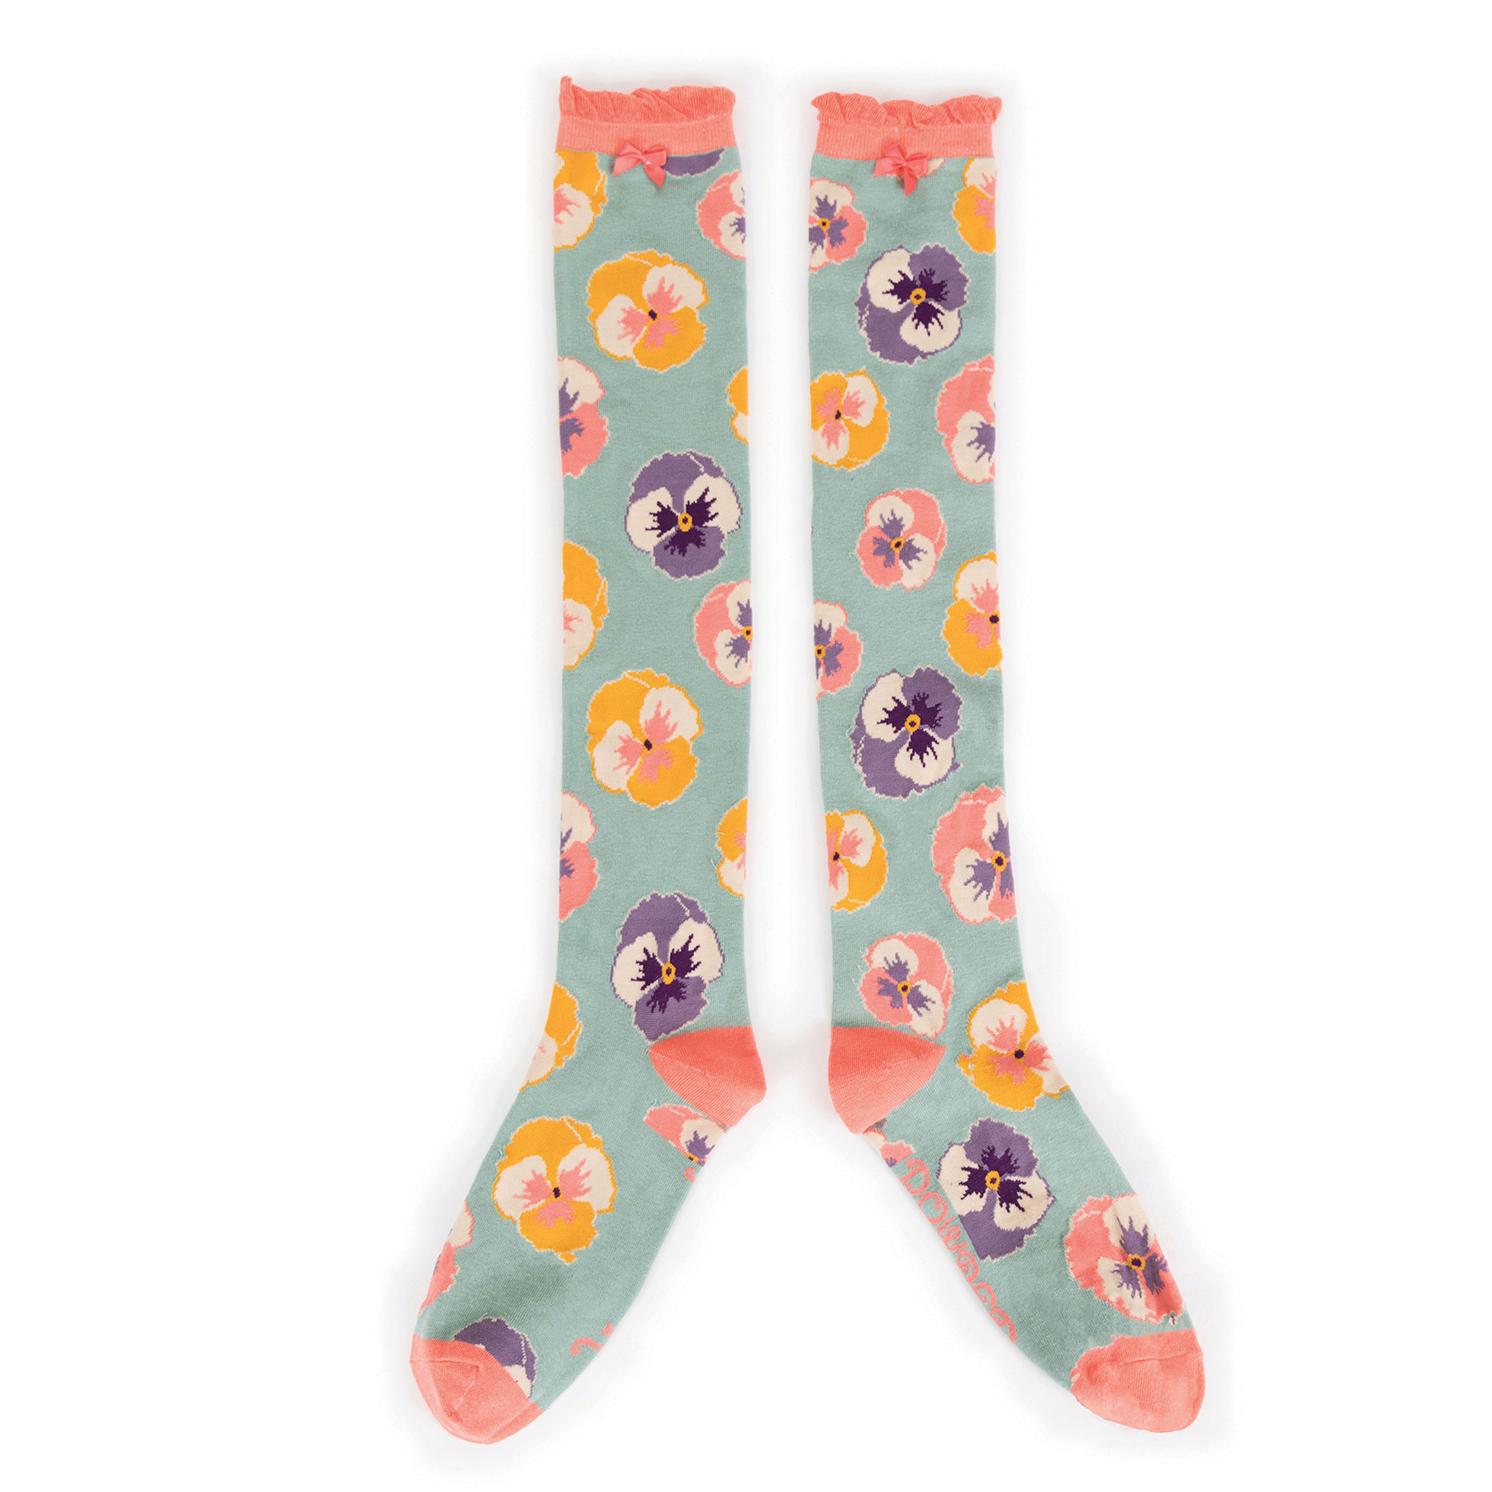 Powder – Mint Pansy Knee High Socks with Presentation Gift Bag